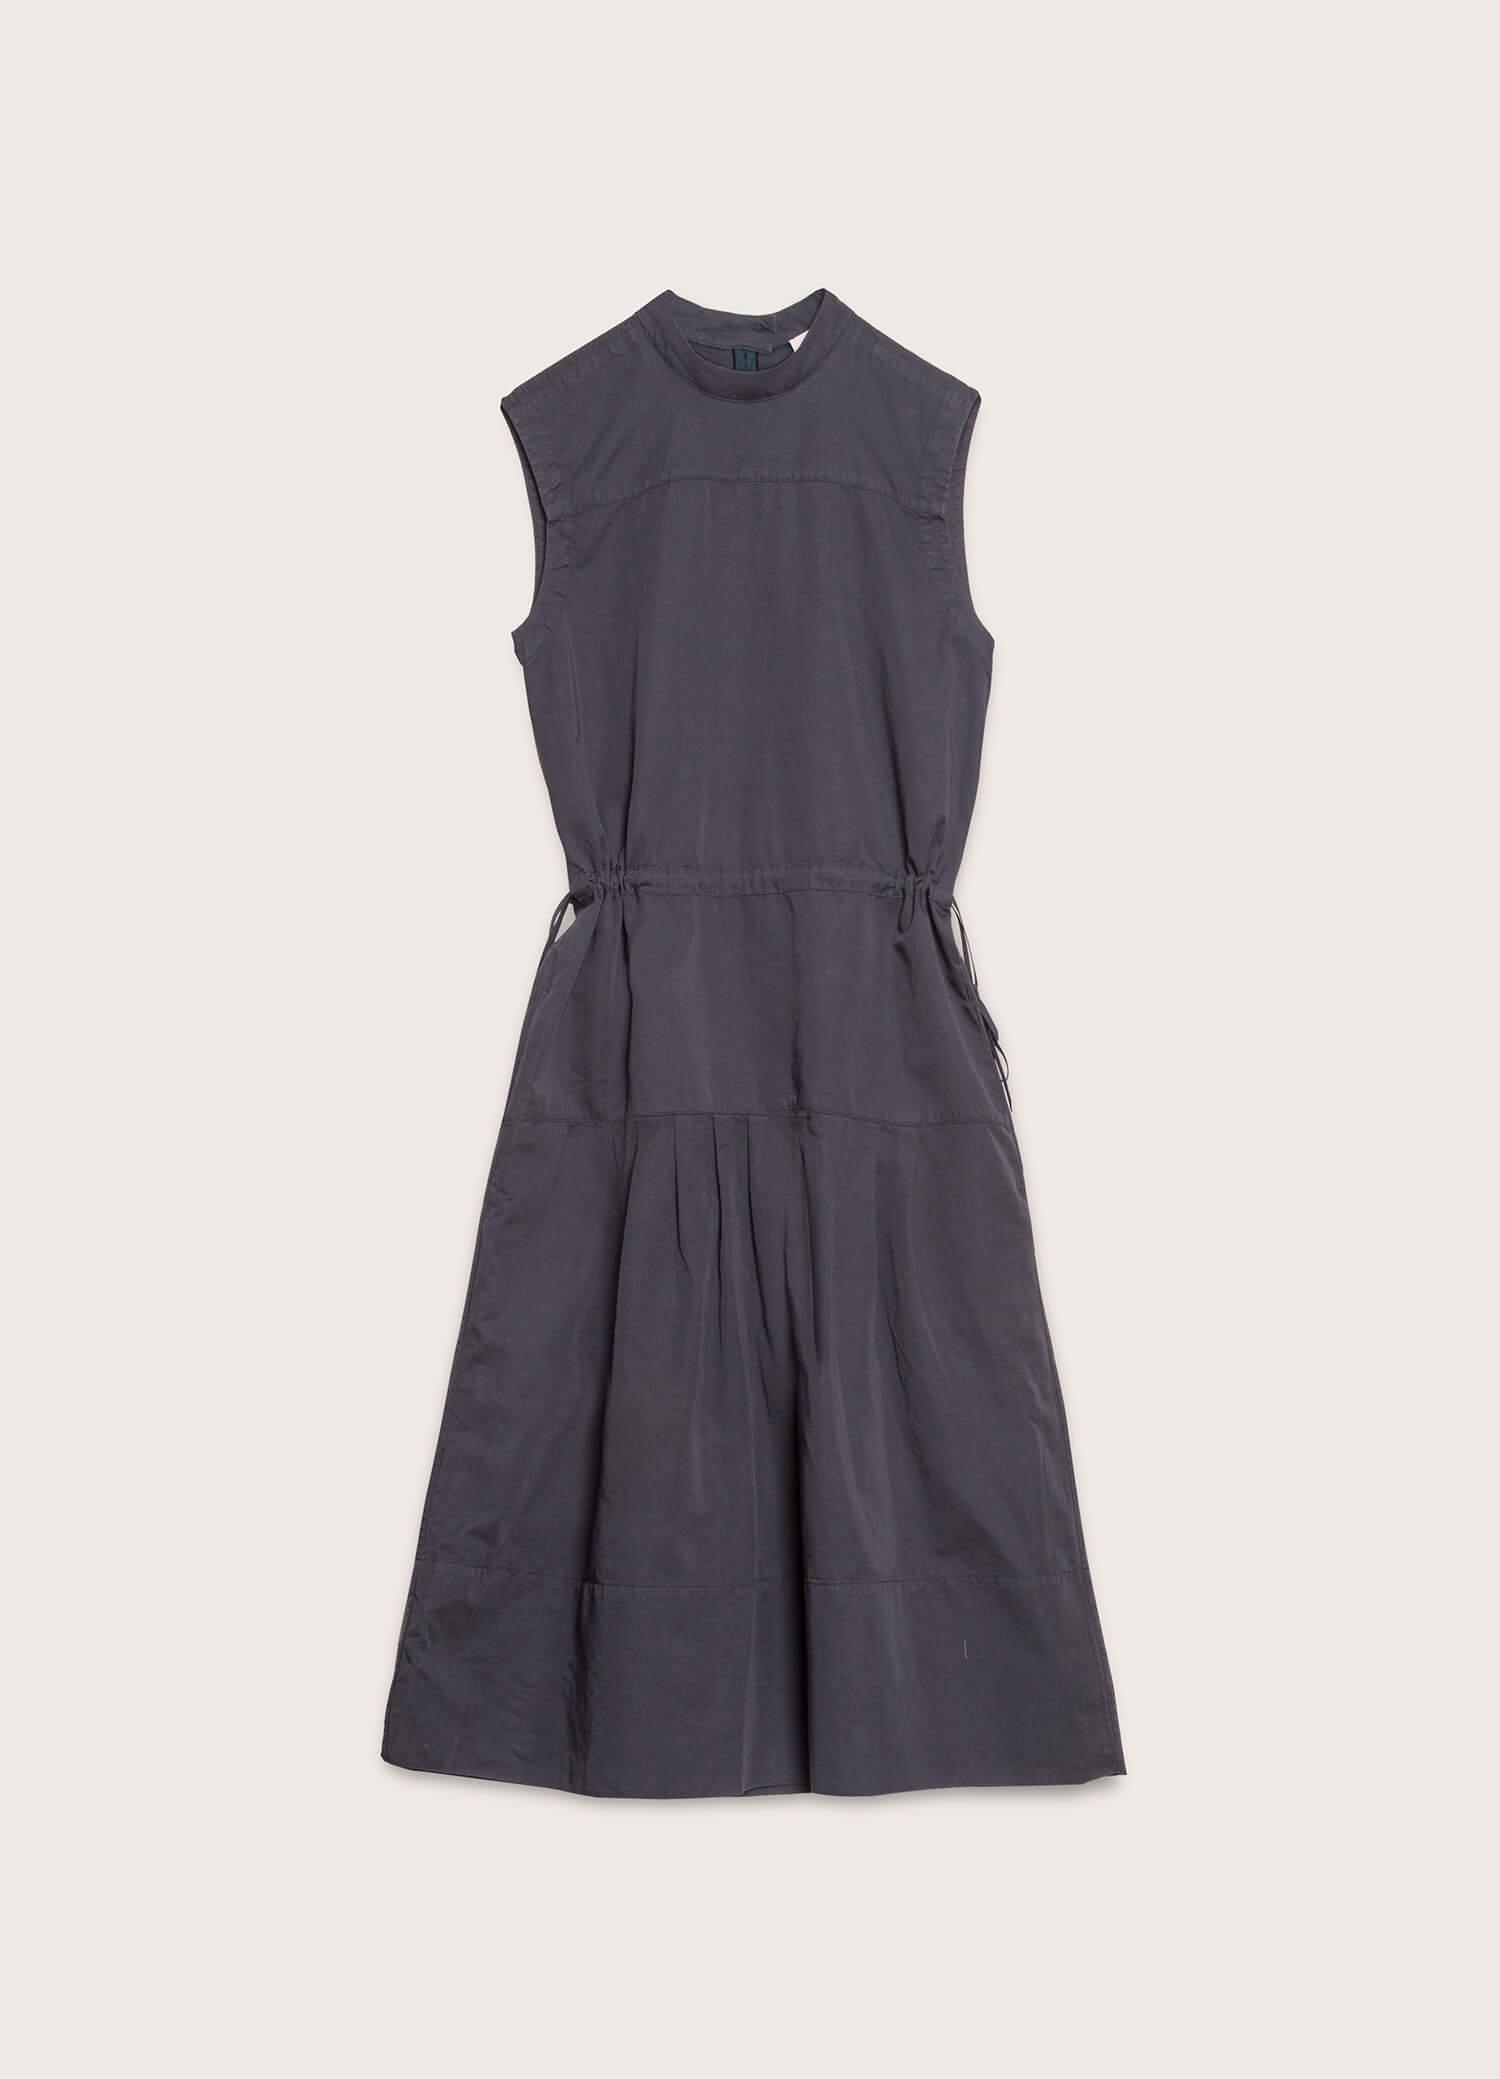 Temple Cotton Linen Dress Navy